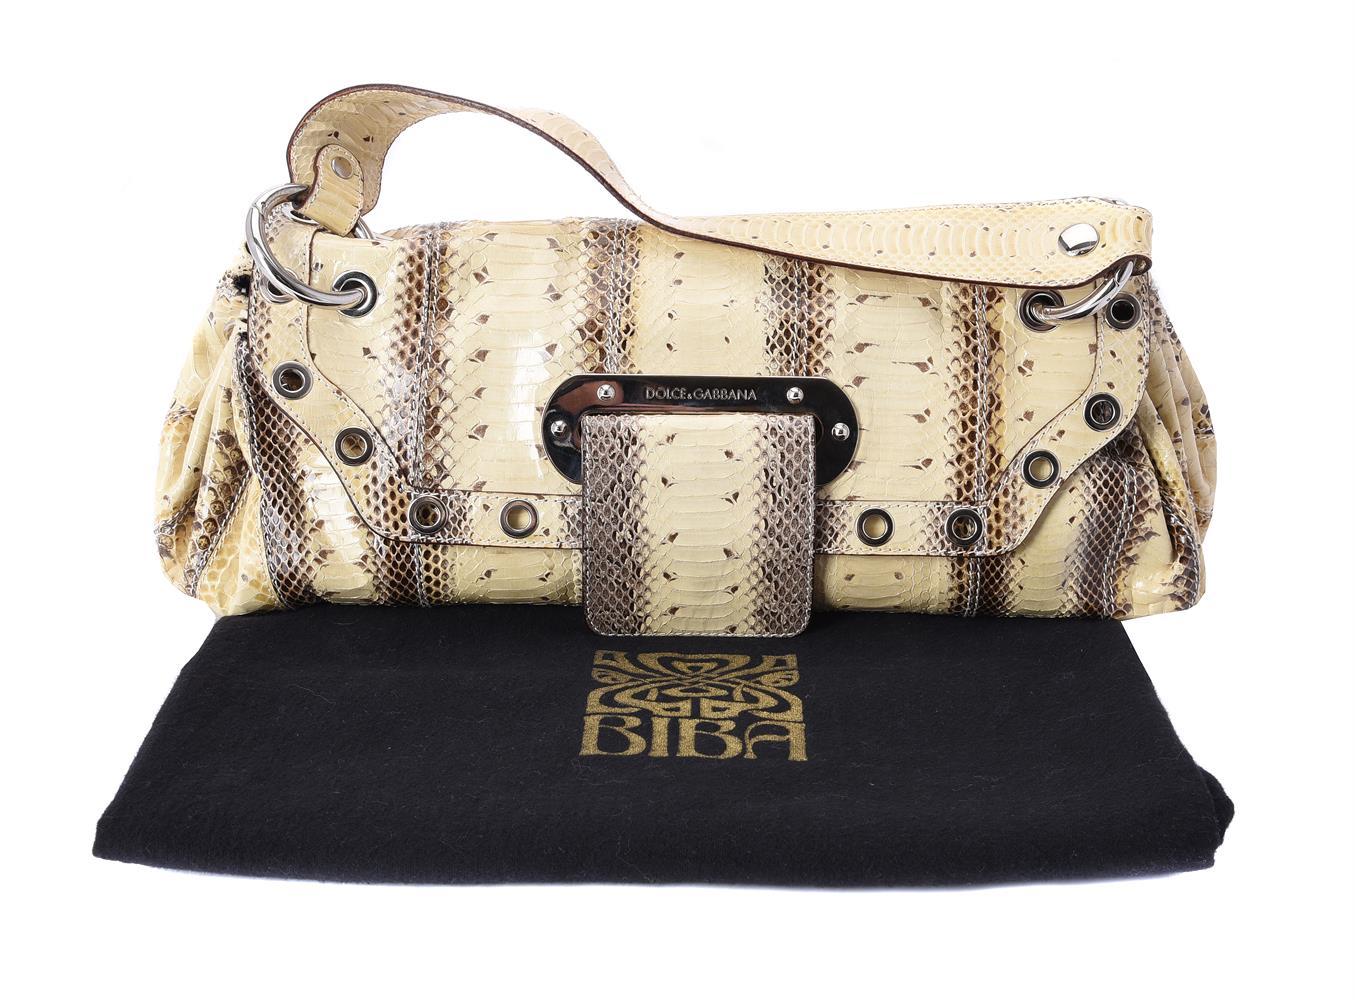 Y Dolce & Gabbana, a python skin handbag - Image 3 of 3